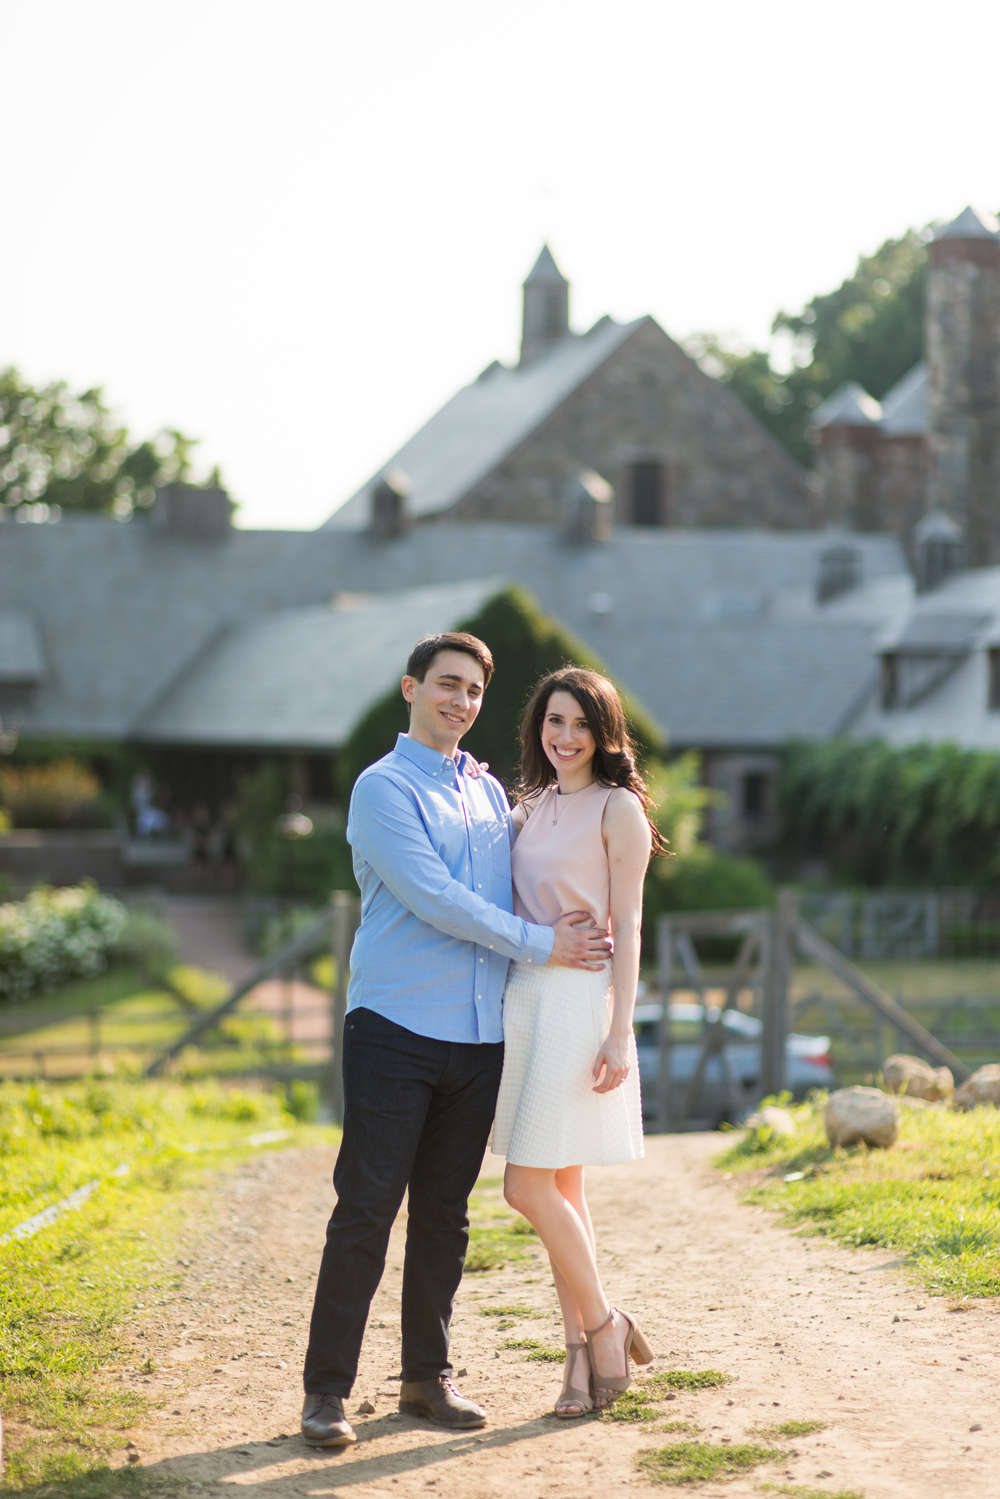 Emily&Aaron_Engagement155.JPG